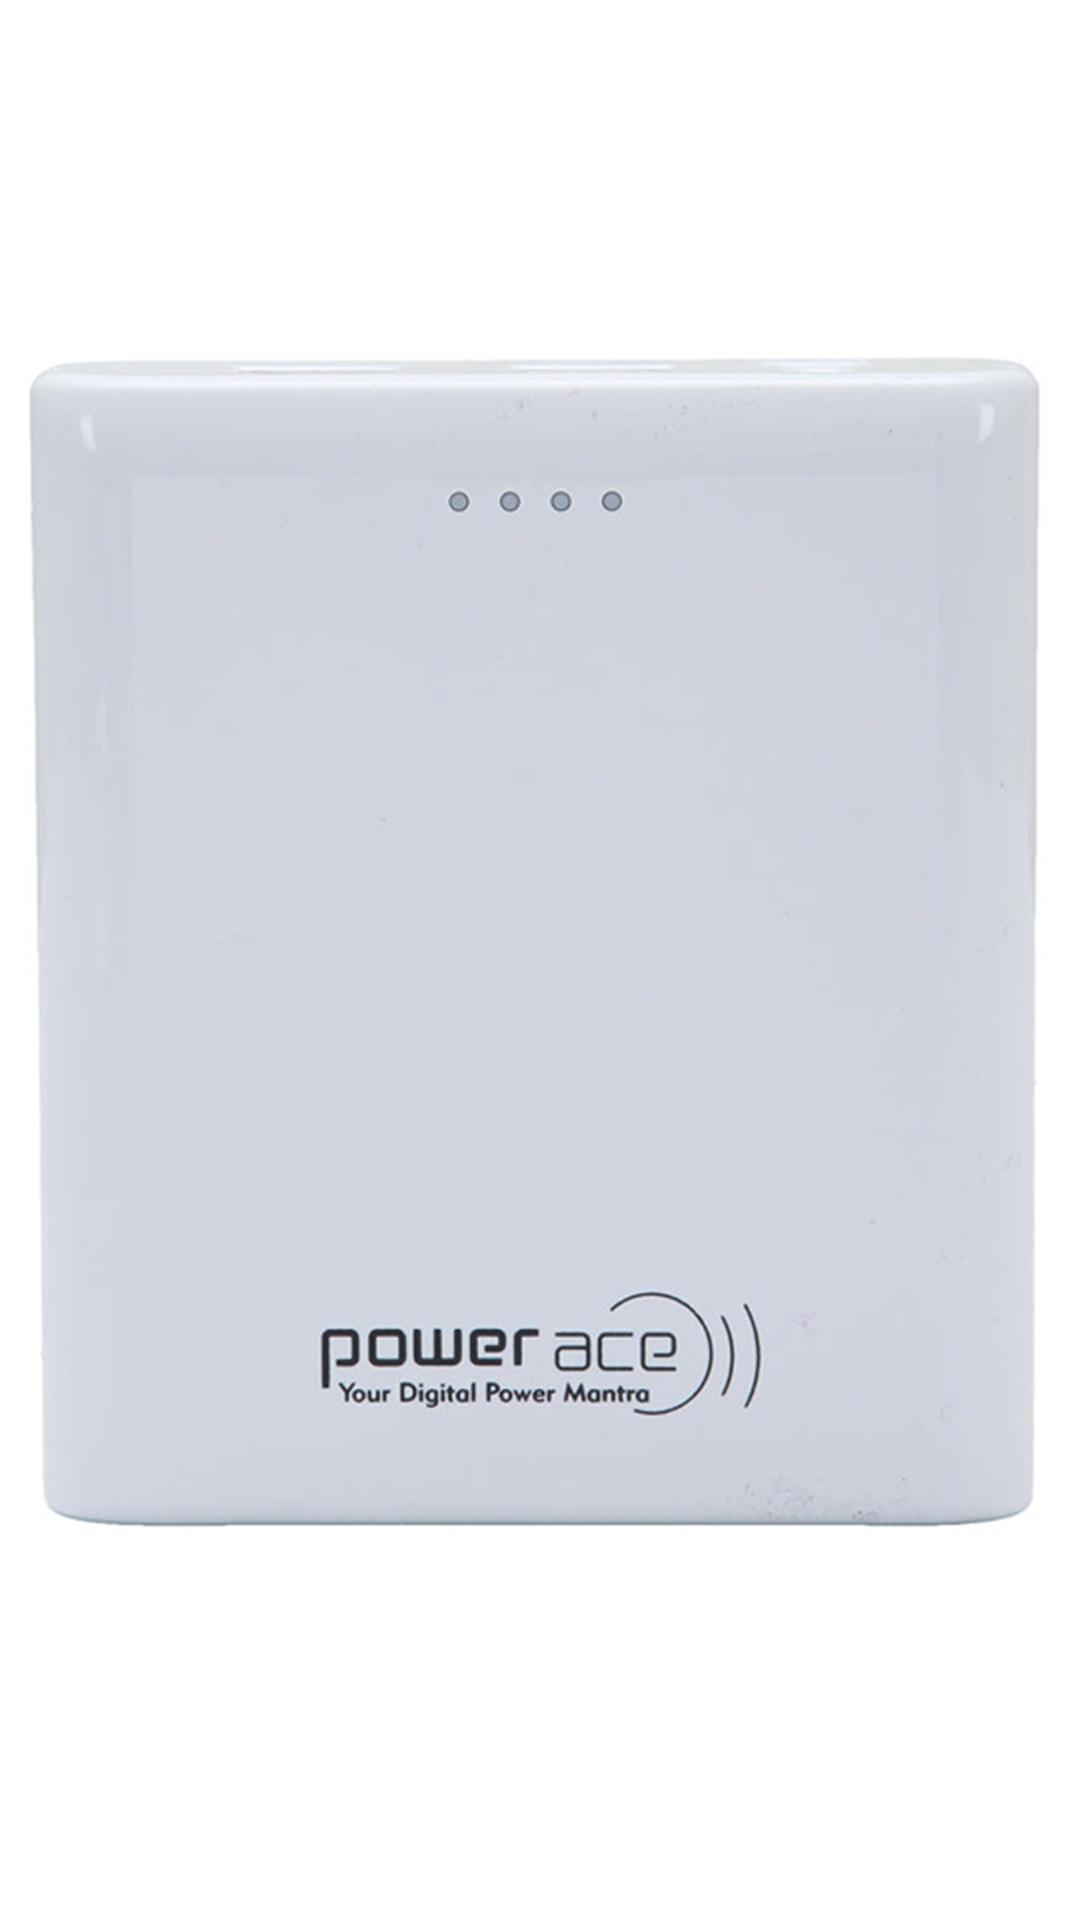 Power Ace White PRP 10400 mAh Power Bank